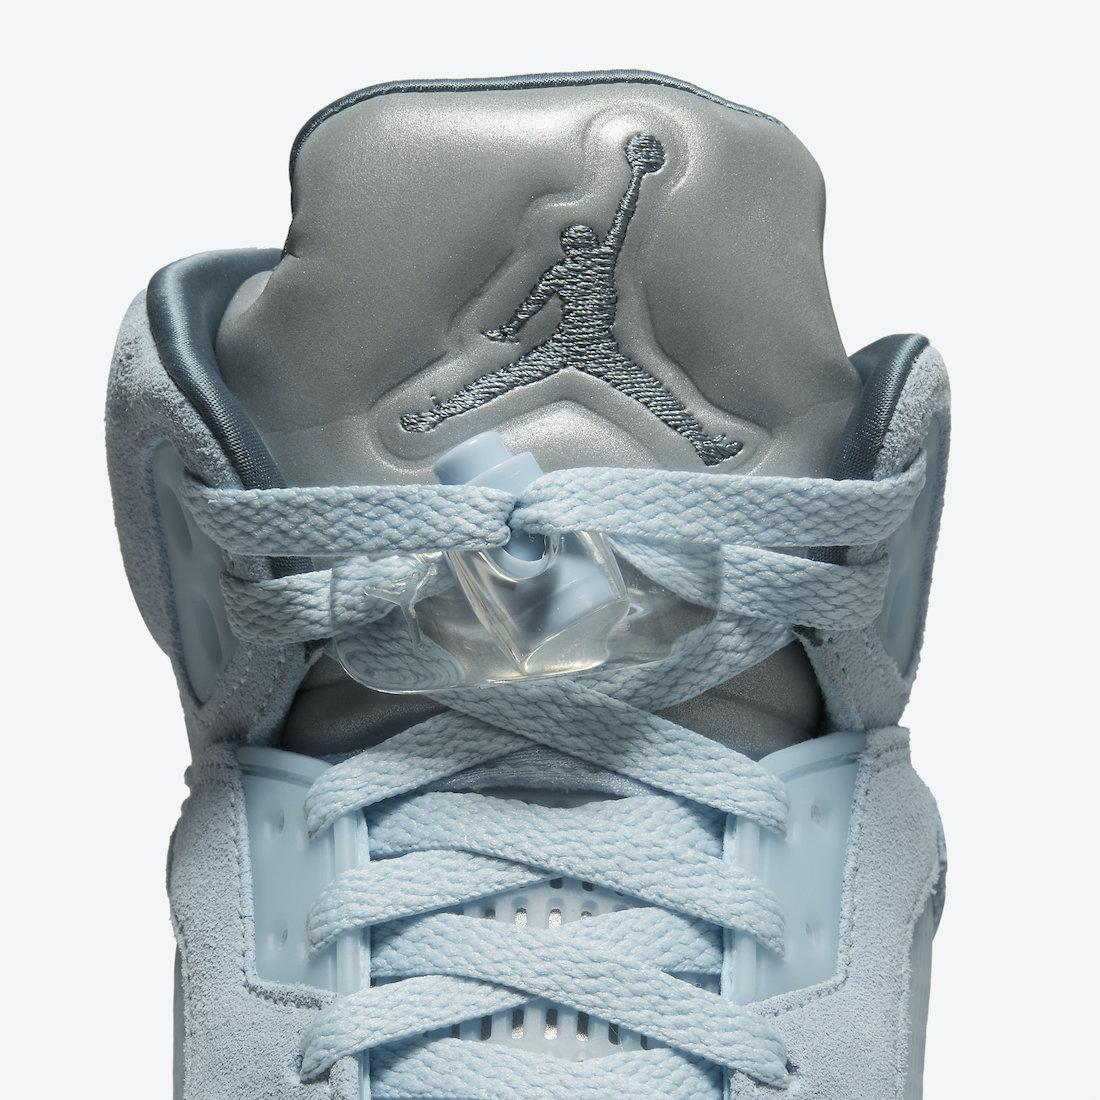 Air-Jordan-5-Bluebird-Photo-Blue-DD9336-400-Release-Date-Price-9